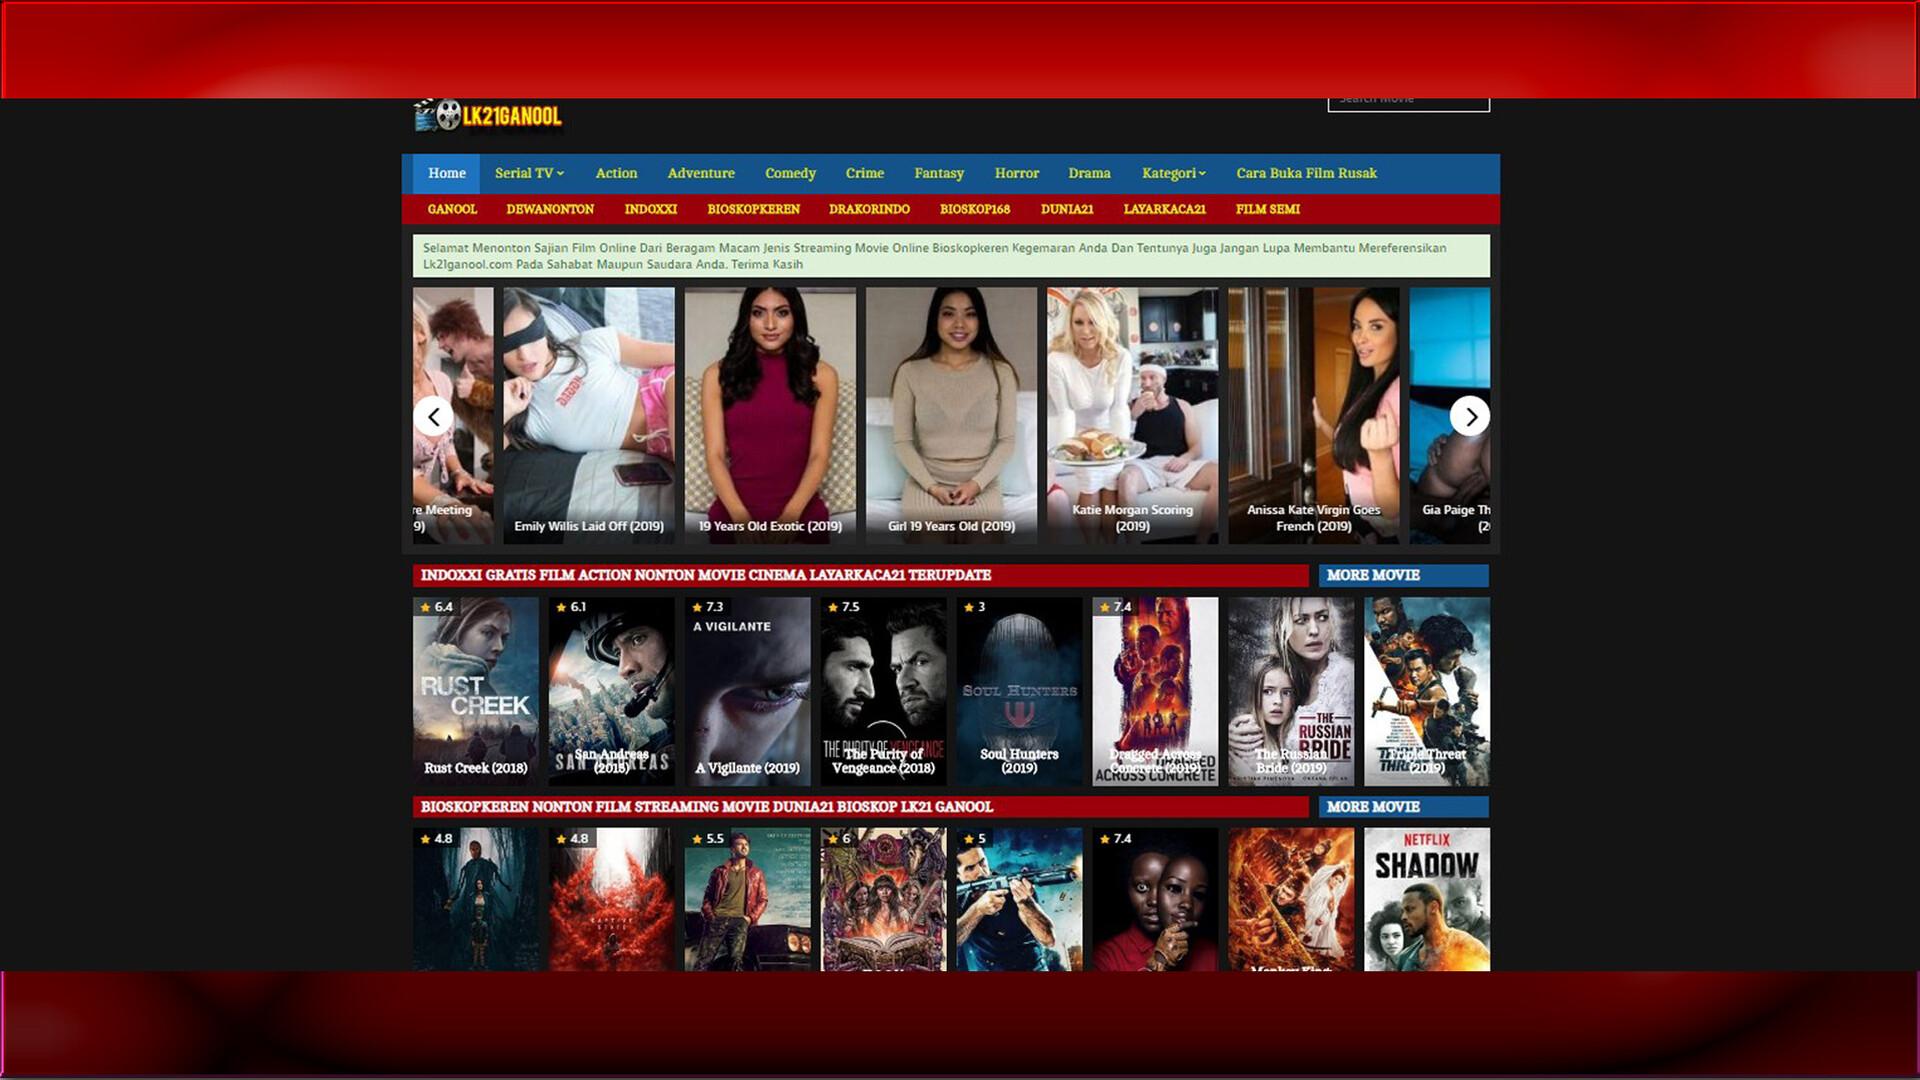 ArtStation - Nonton Film Online Layarkaca21 Gratis, Yuanita Nindy